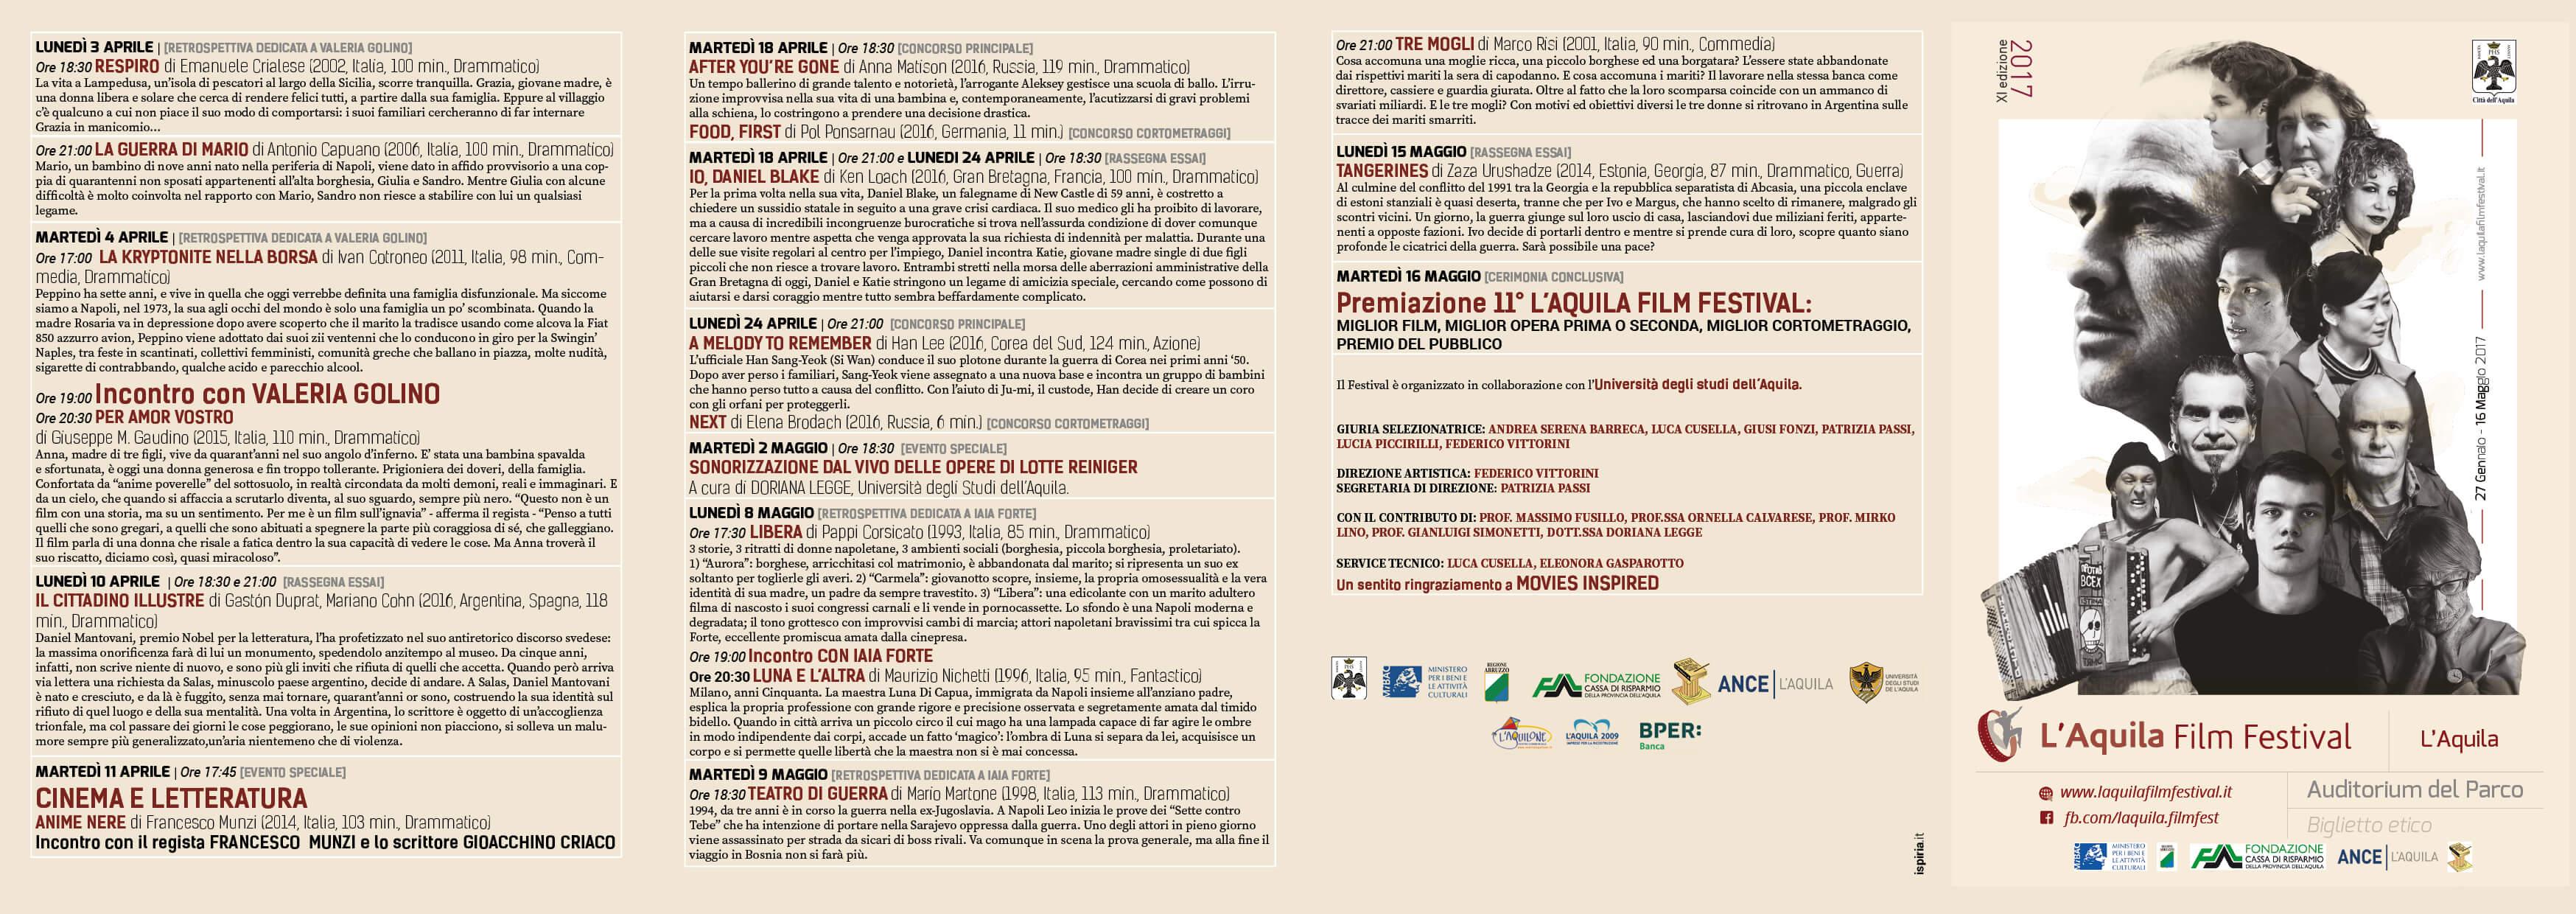 pieghevole aquila film festival 0703